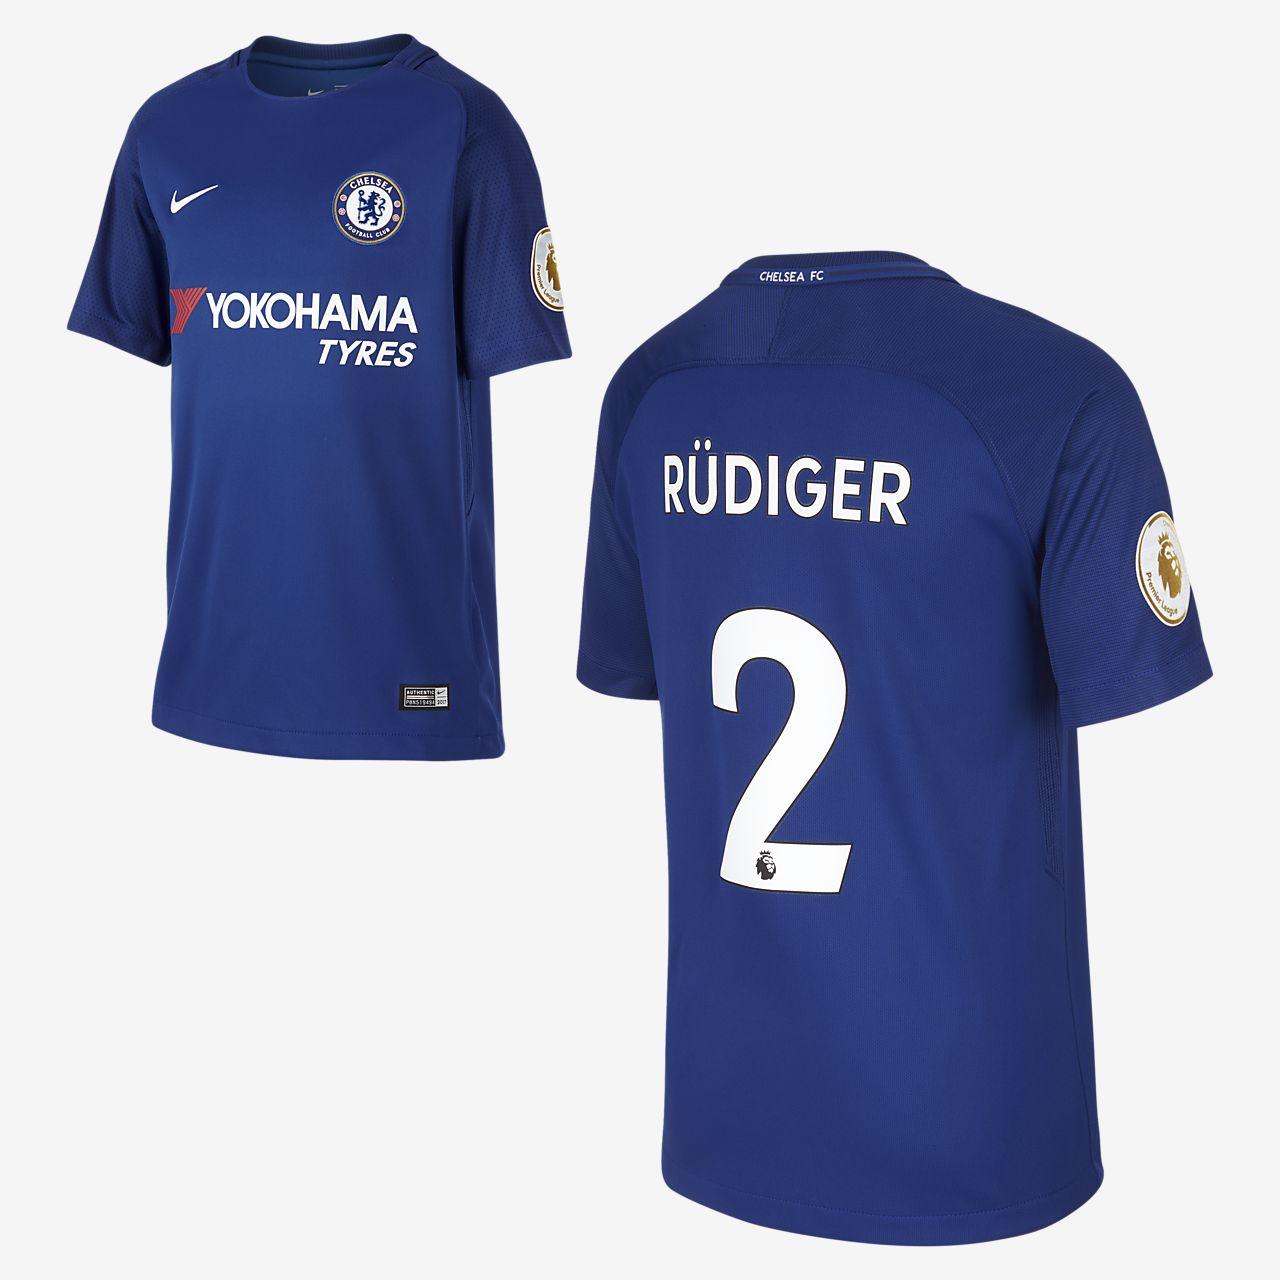 2017/18 Chelsea FC Stadium Home (Antonio Rüdiger) Fußballtrikot für ältere Kinder